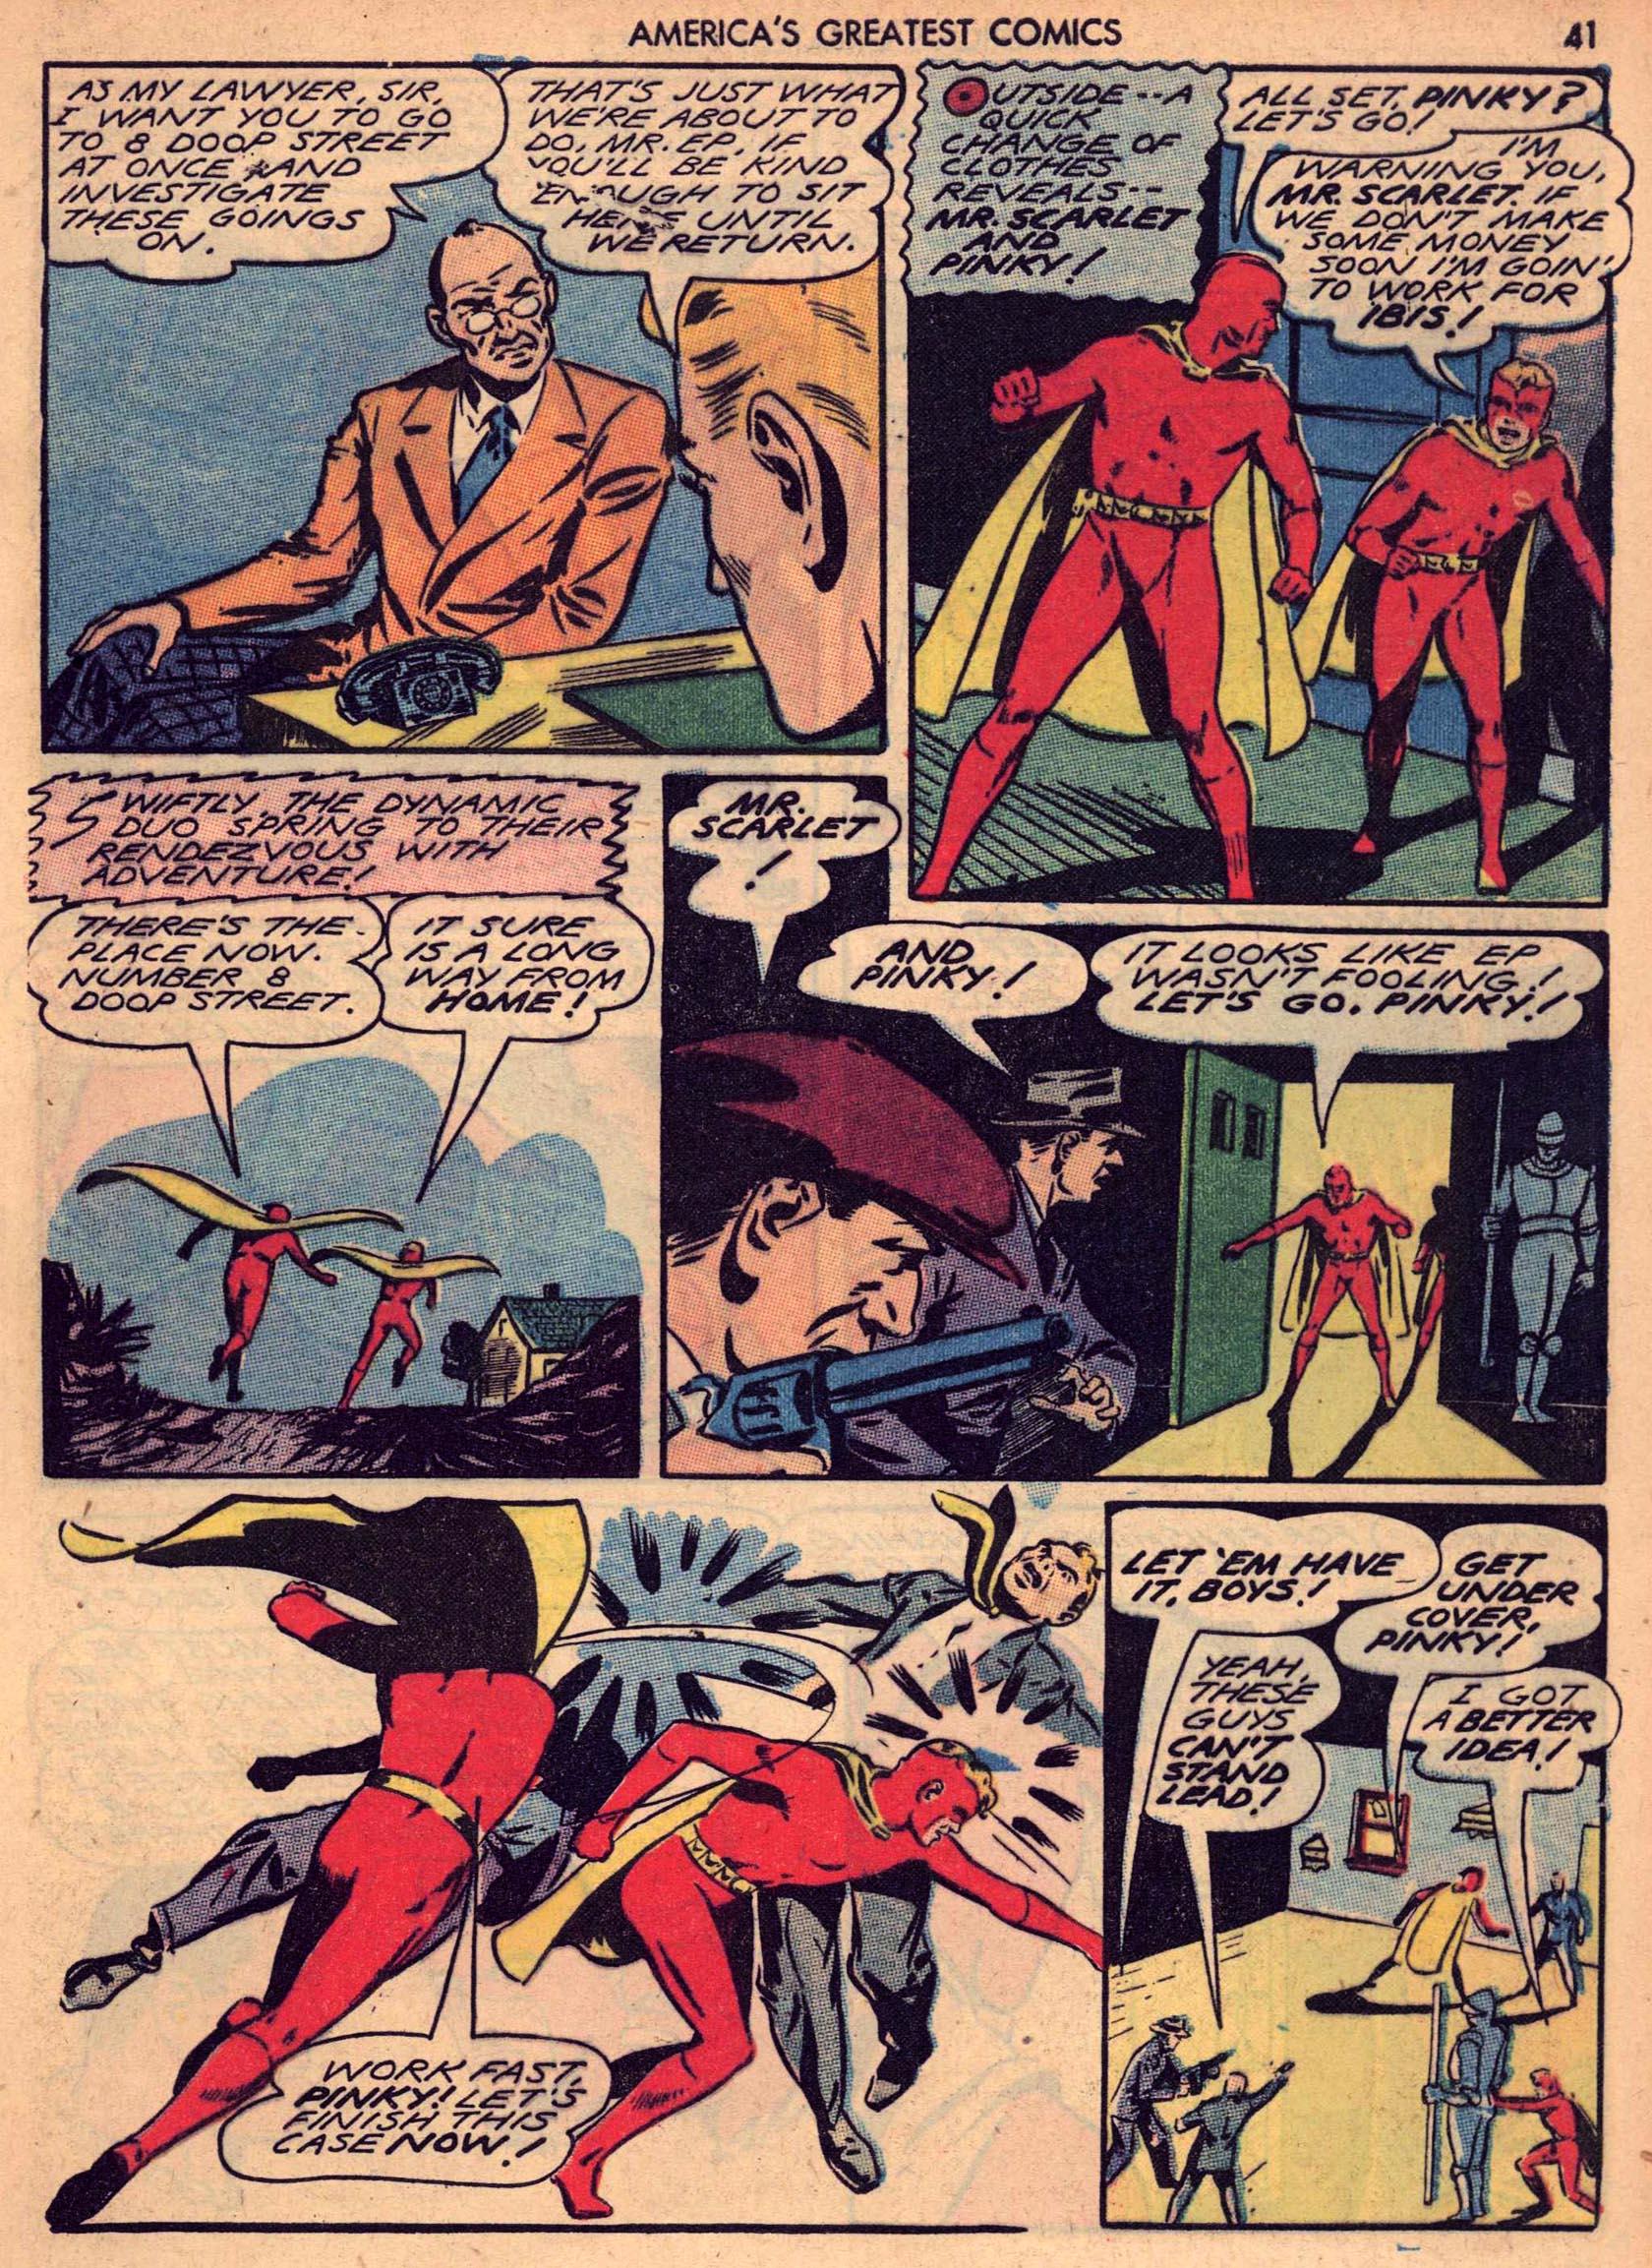 Read online America's Greatest Comics comic -  Issue #7 - 40